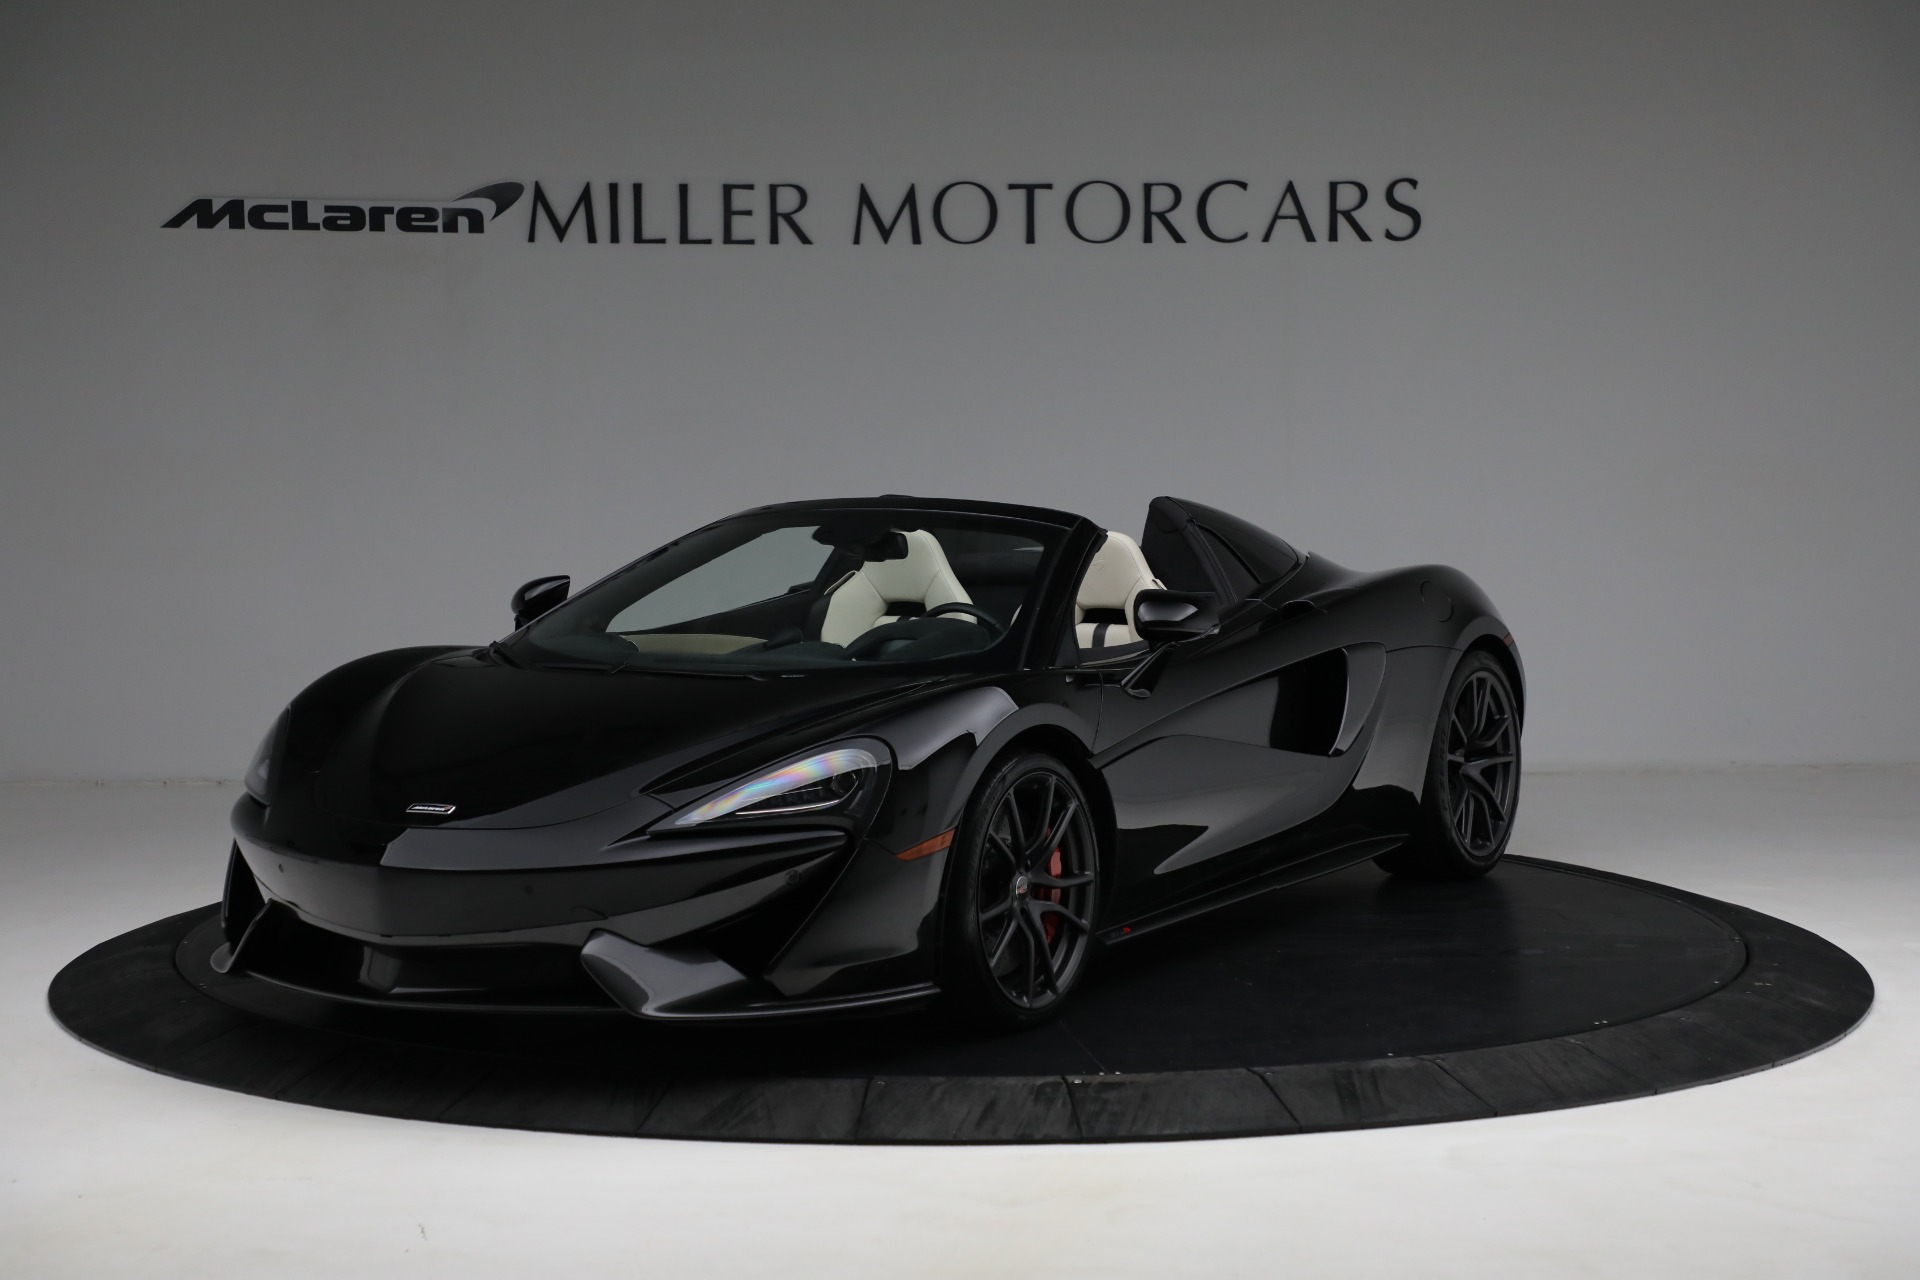 New 2018 McLaren 570S Spider for sale Sold at McLaren Greenwich in Greenwich CT 06830 1